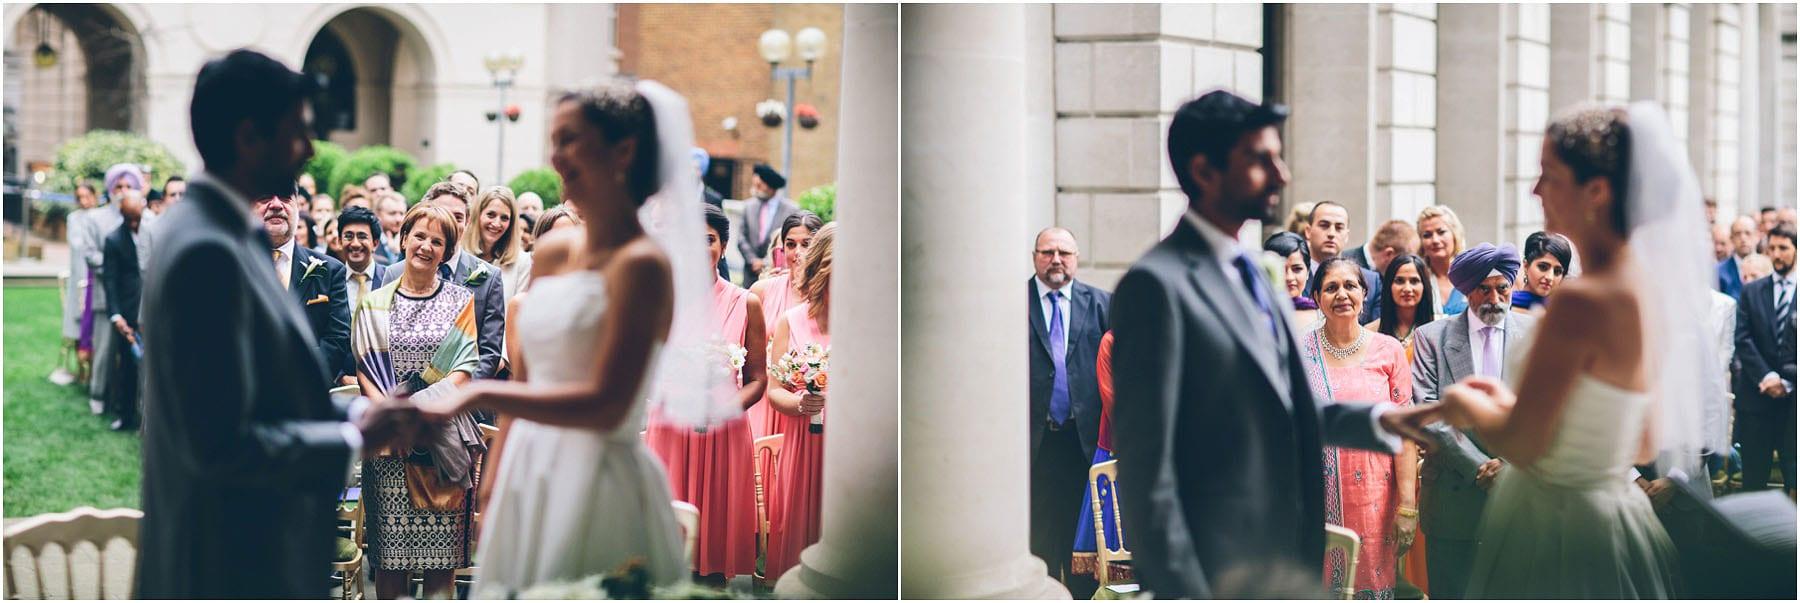 Gibson_Hall_Wedding_Photography_0133